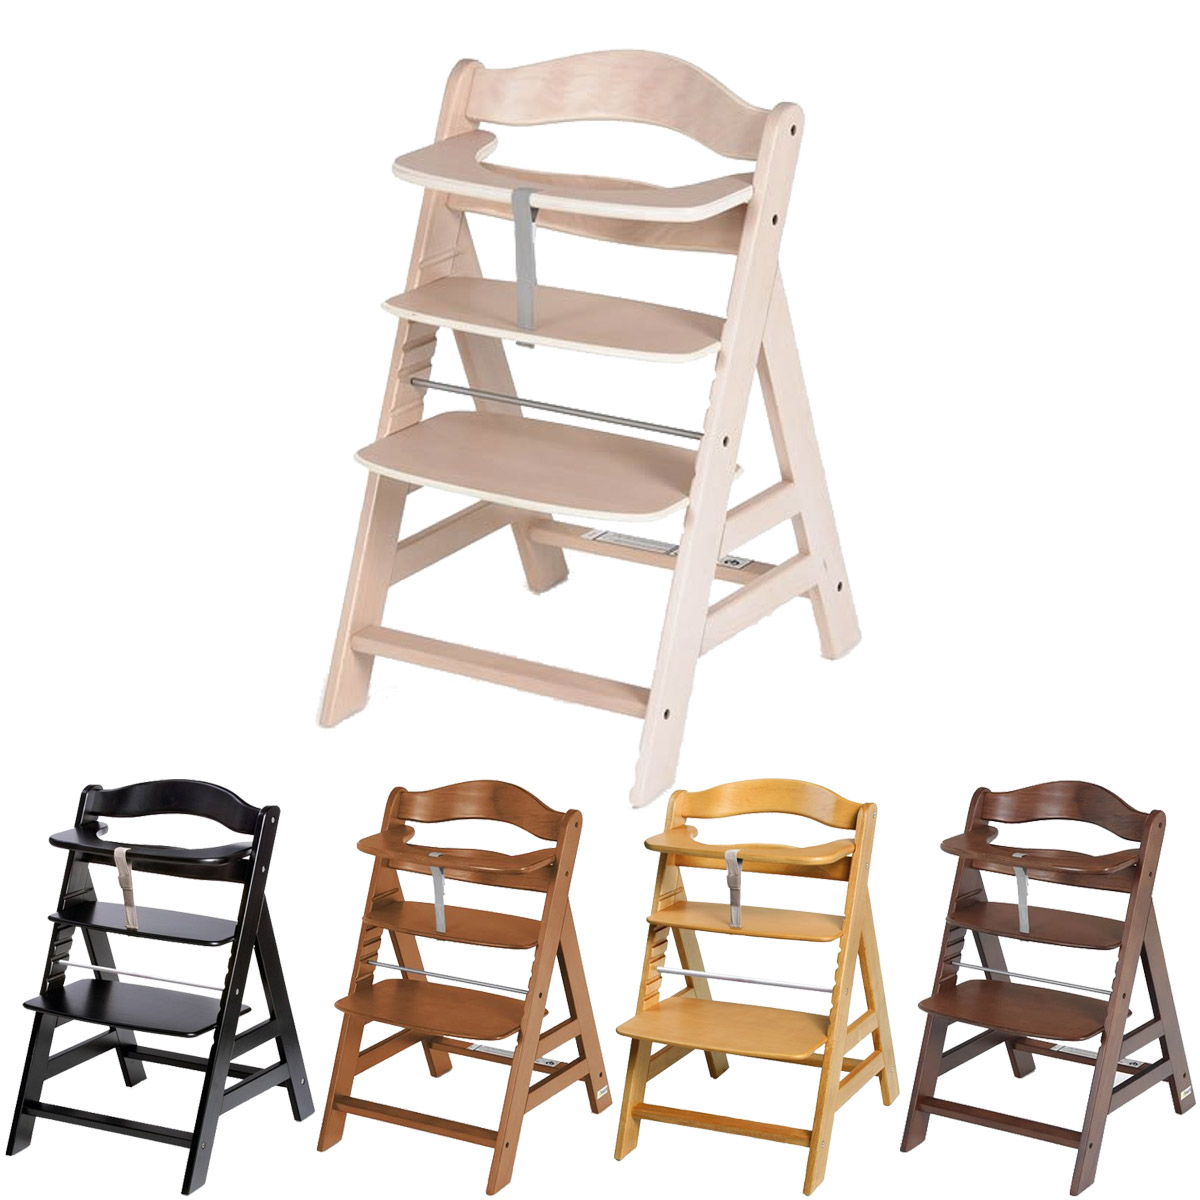 hauck alpha treppen hochstuhl farbe w hlbar neu ebay. Black Bedroom Furniture Sets. Home Design Ideas